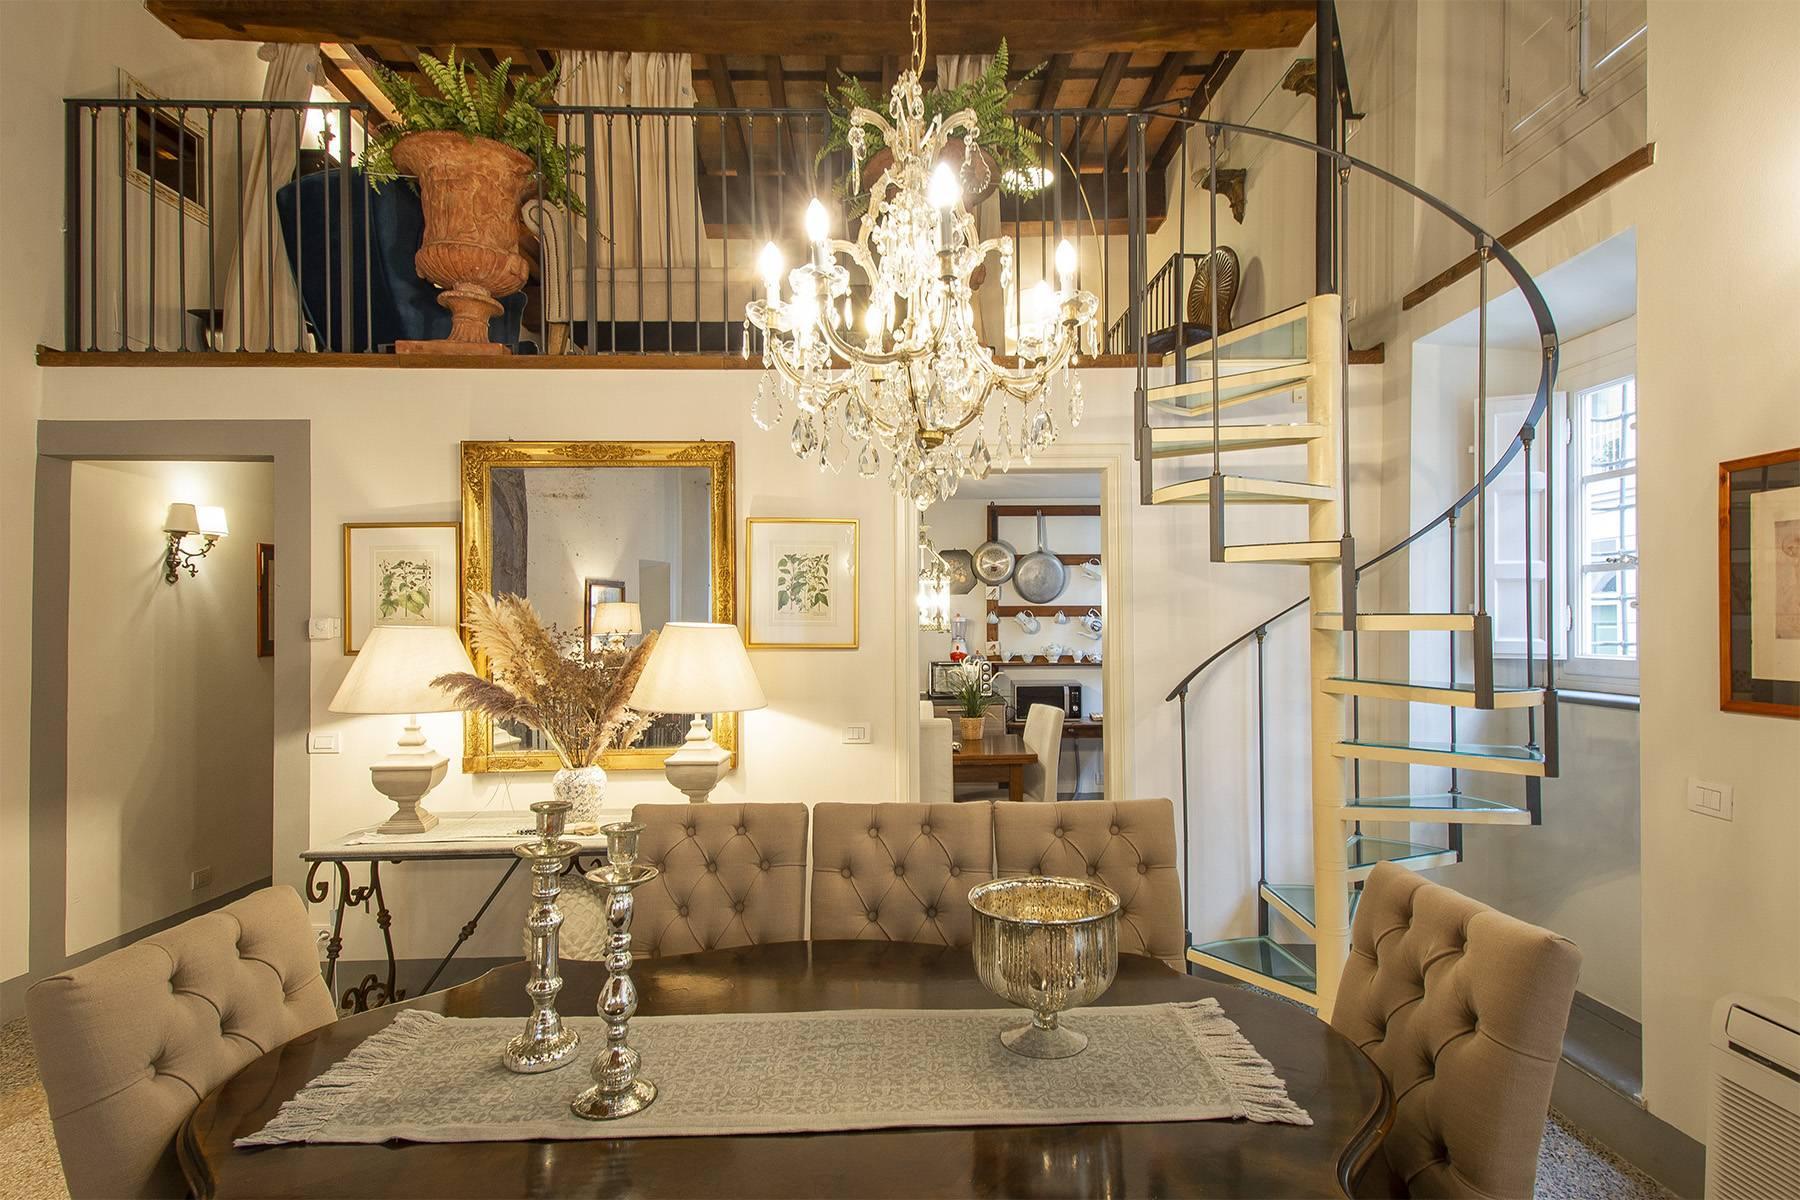 Appartement exclusif au coeur de Lucca - 4